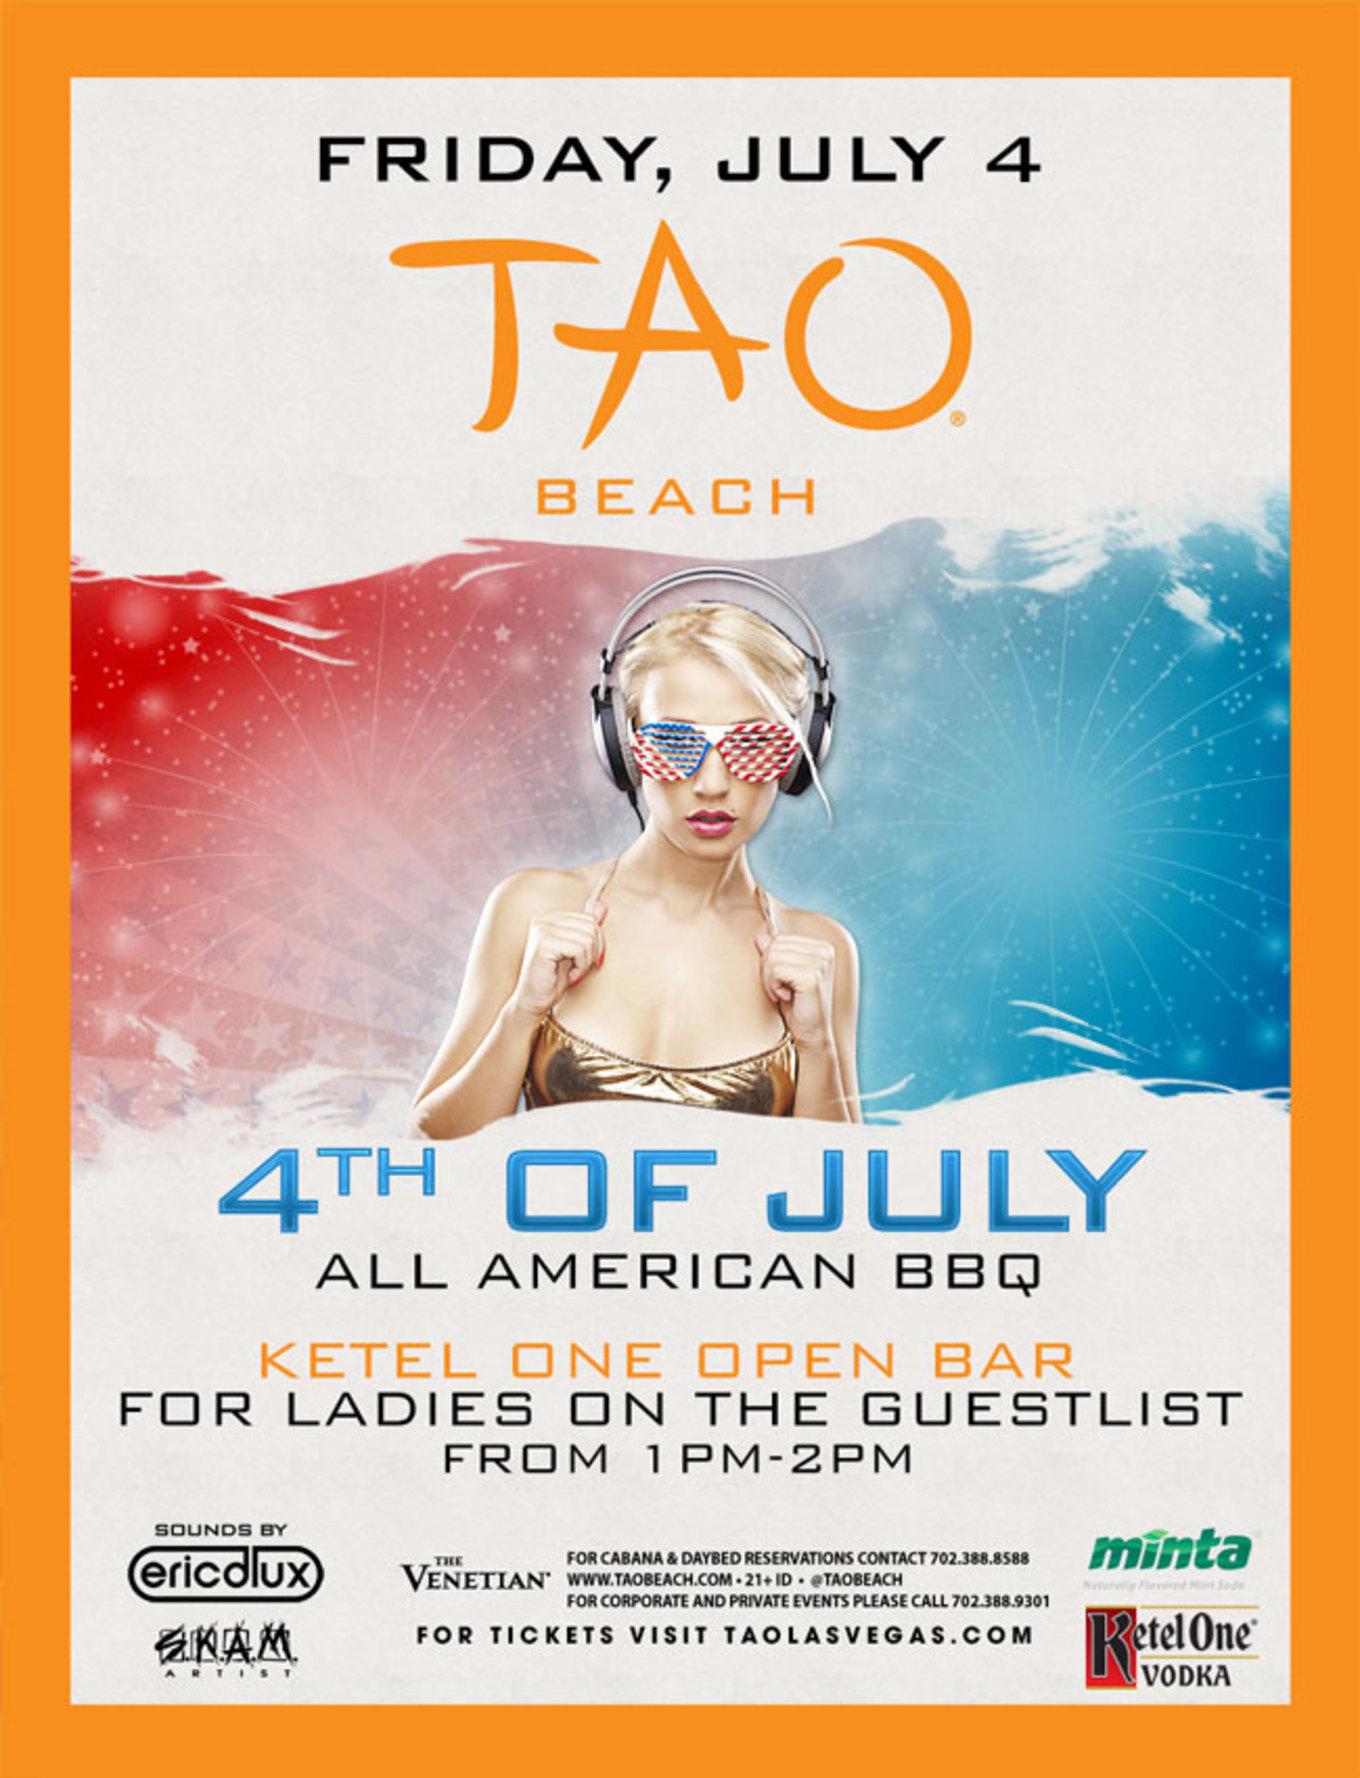 4th of July BBQ - TAO Beach - Tickets - TAO Beach, Las Vegas